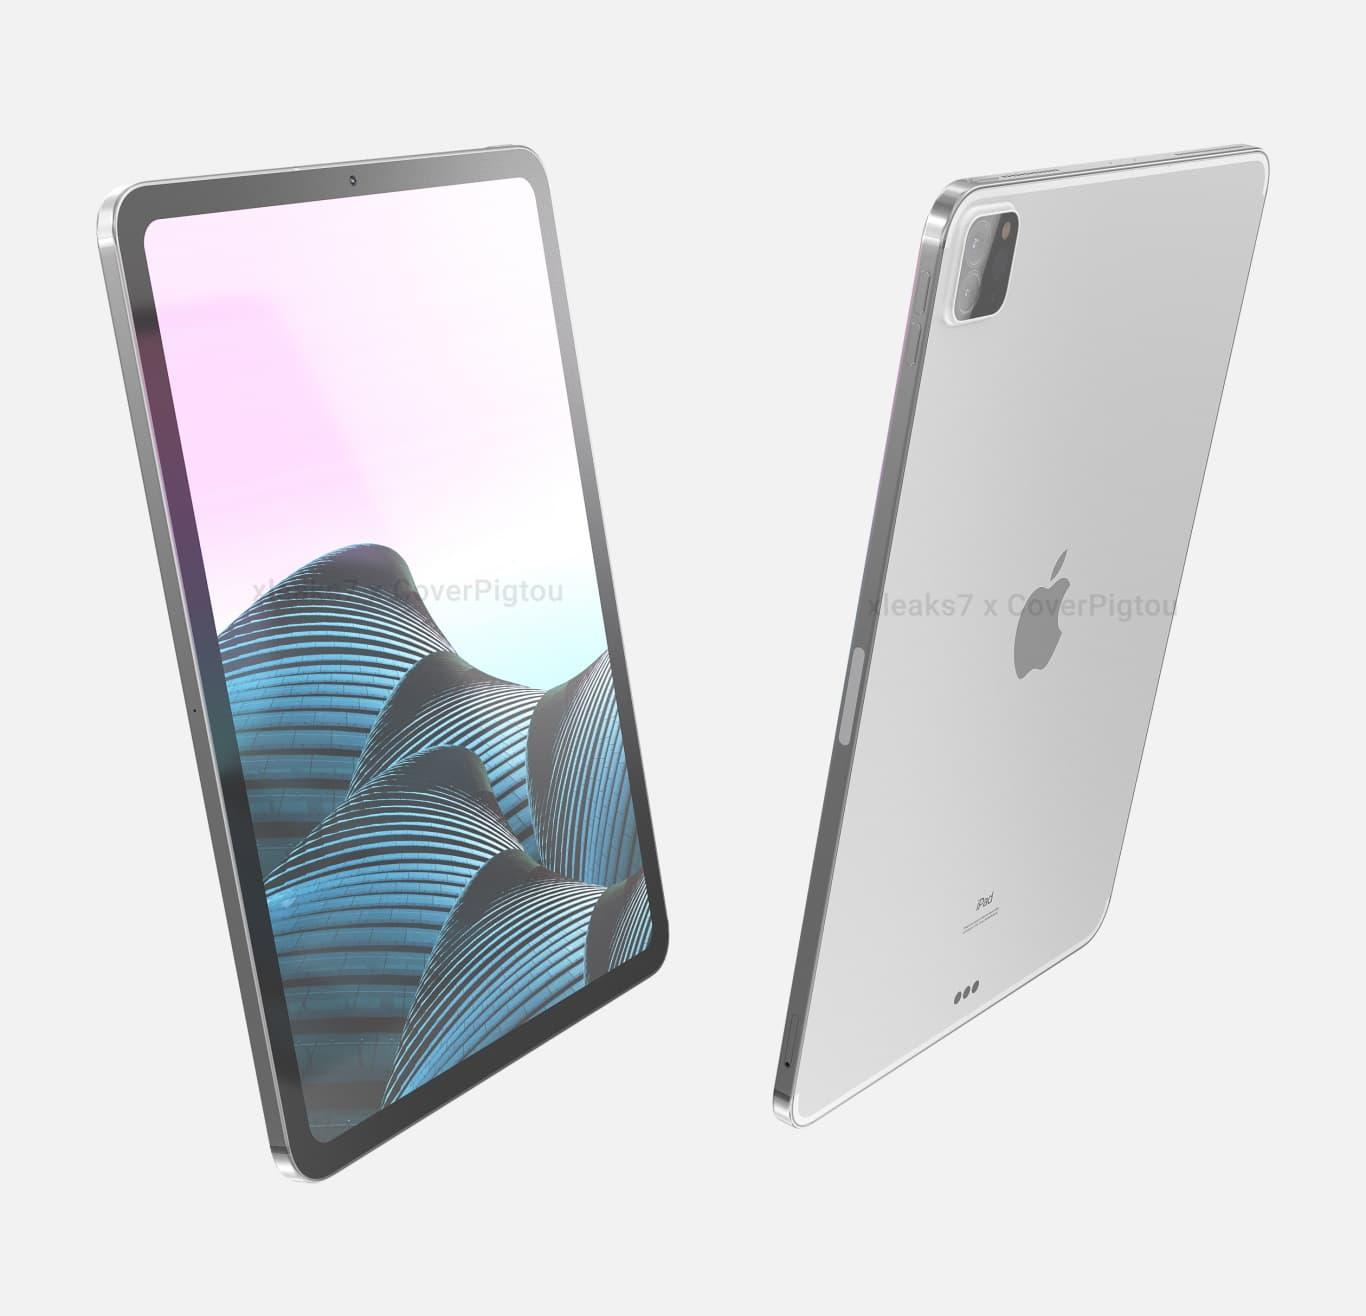 iPad Pro 2021 refresh with a mini LED display, new M1 ...